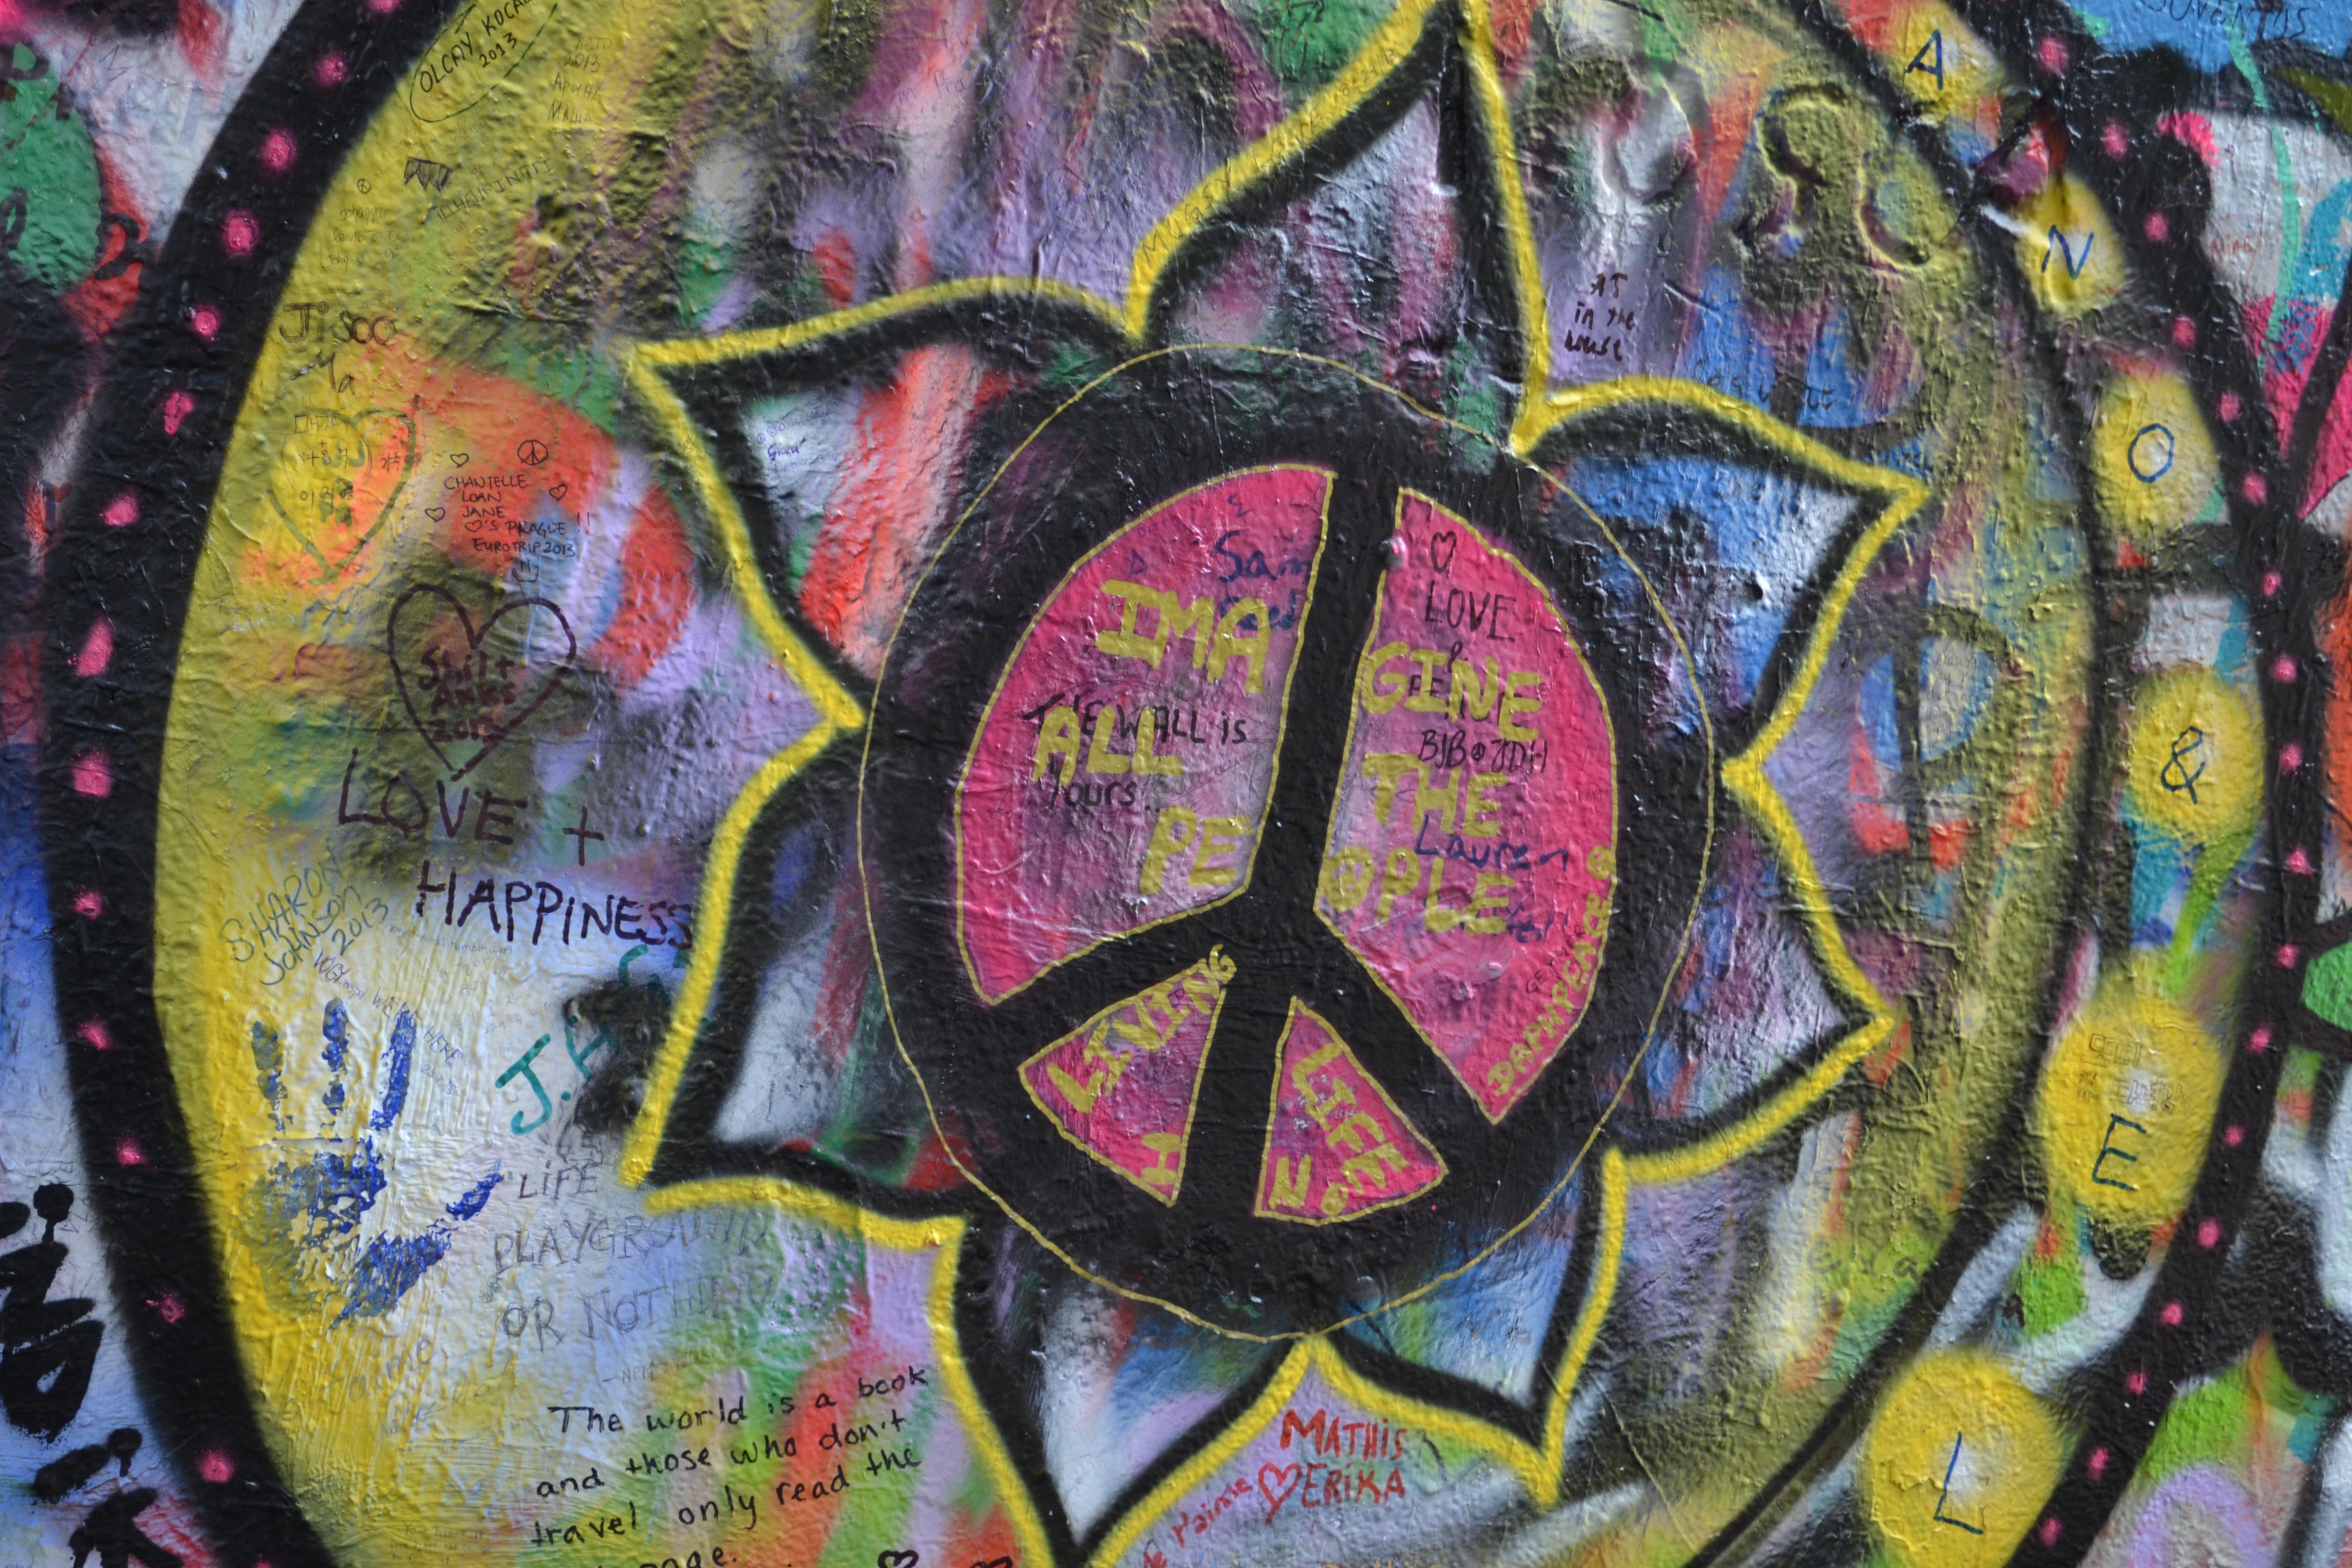 Grafitti wall painting - Urban Wall Love Symbol Spray Color Artist Paint Grunge Prague Graffiti Artwork Painting Memorial Art Drawing